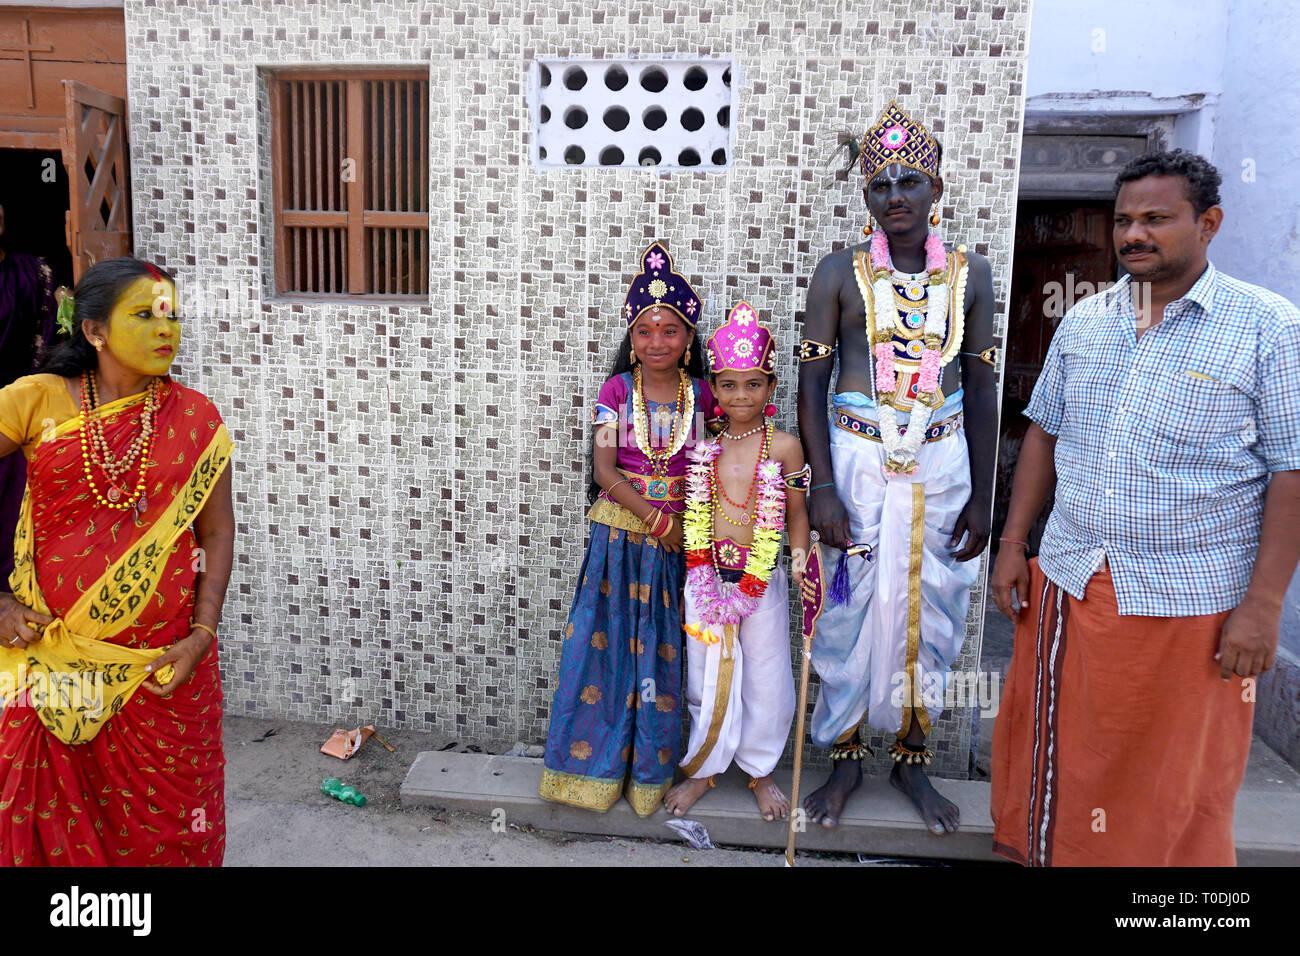 People dress as Hindu Gods near Mutharamman temple, Tamil Nadu, India, Asia - Stock Image